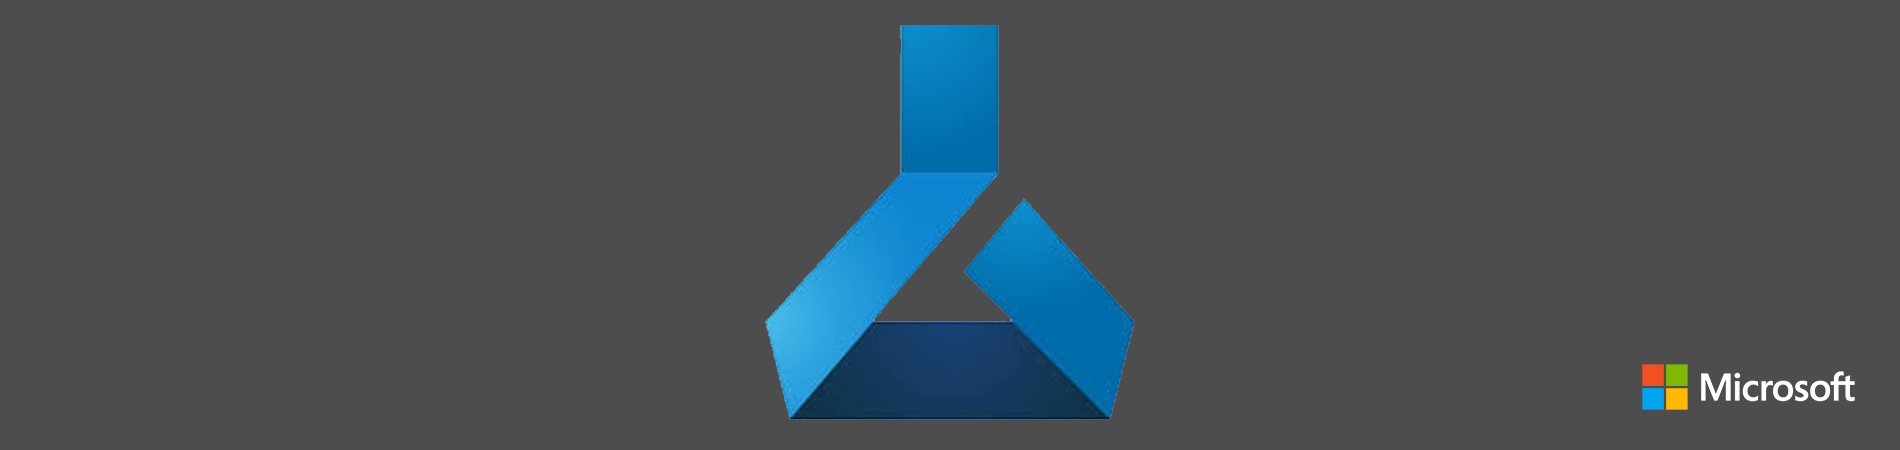 Azure ML Workbench: Начало работы